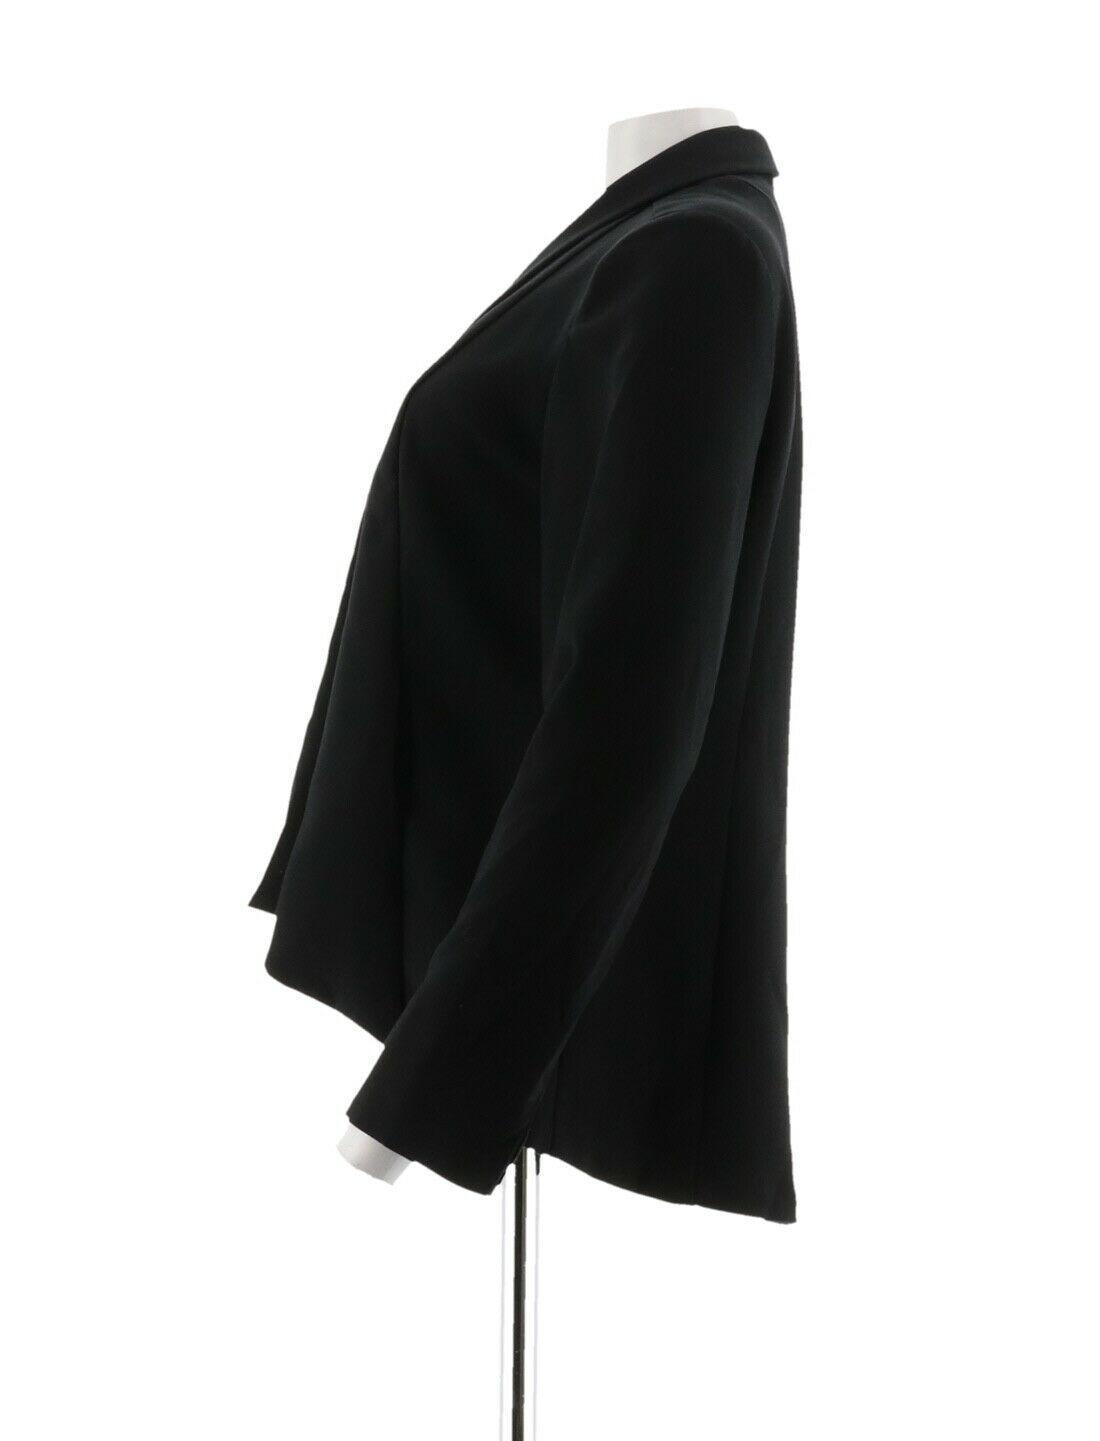 H Halston Long Slv Open Front Jacket Seam Black 12 NEW A303200 image 2